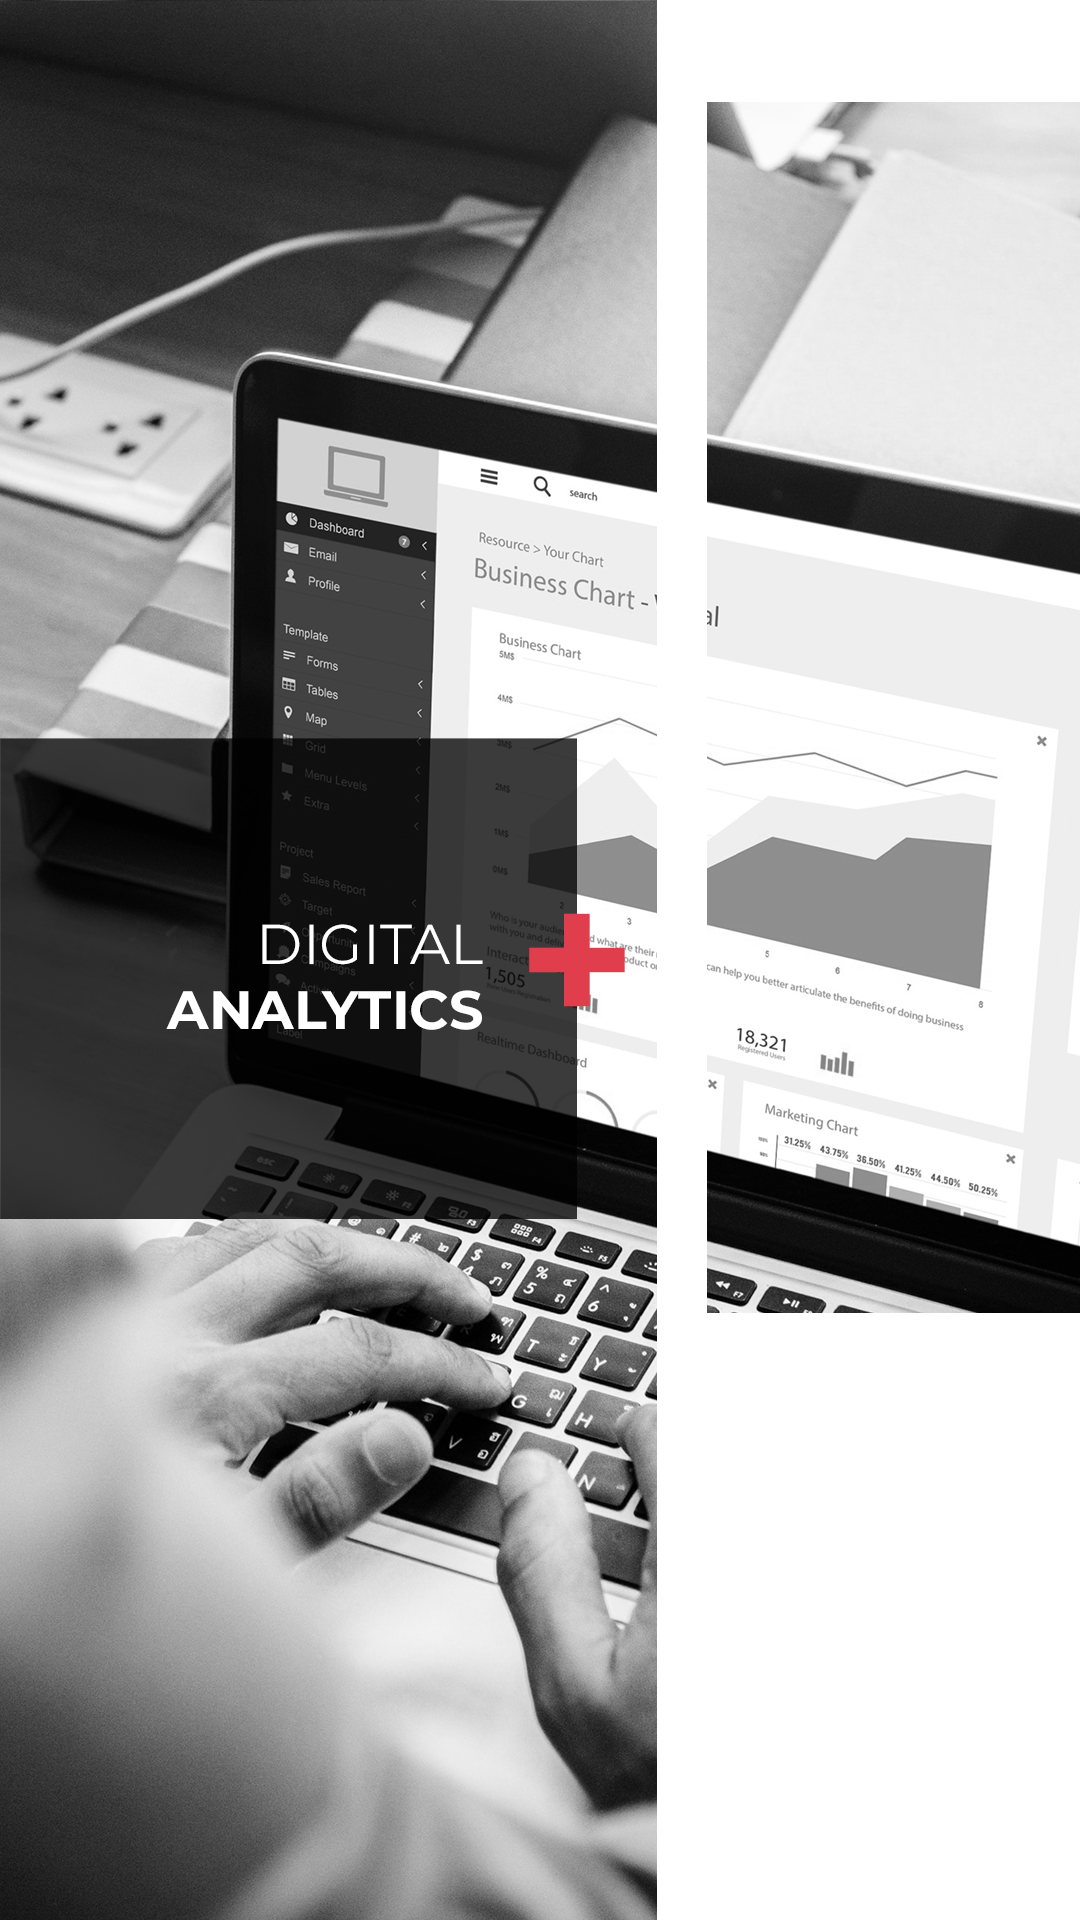 digitalAnalyticsInside.png